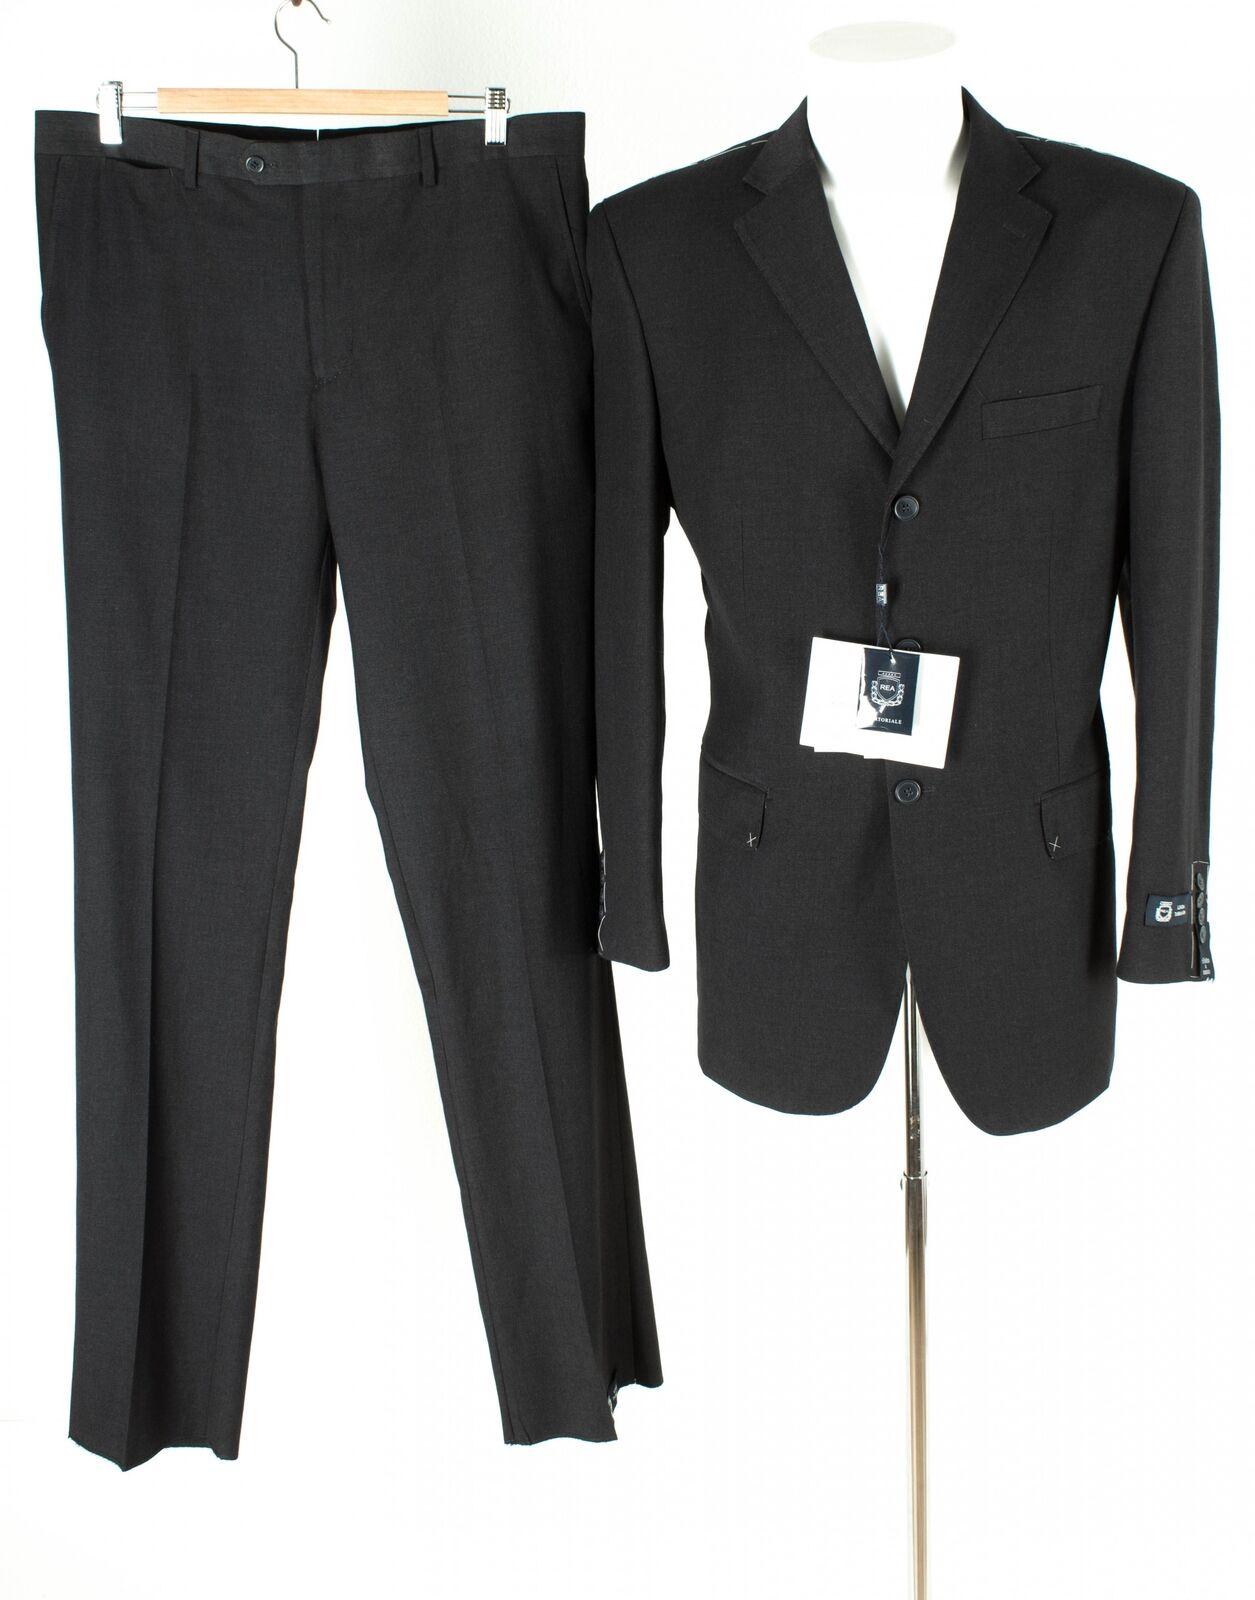 REA Anzug Slim Fit NEU Gr. 54 Drop 6     | Feinen Qualität  | Langfristiger Ruf  | München Online Shop